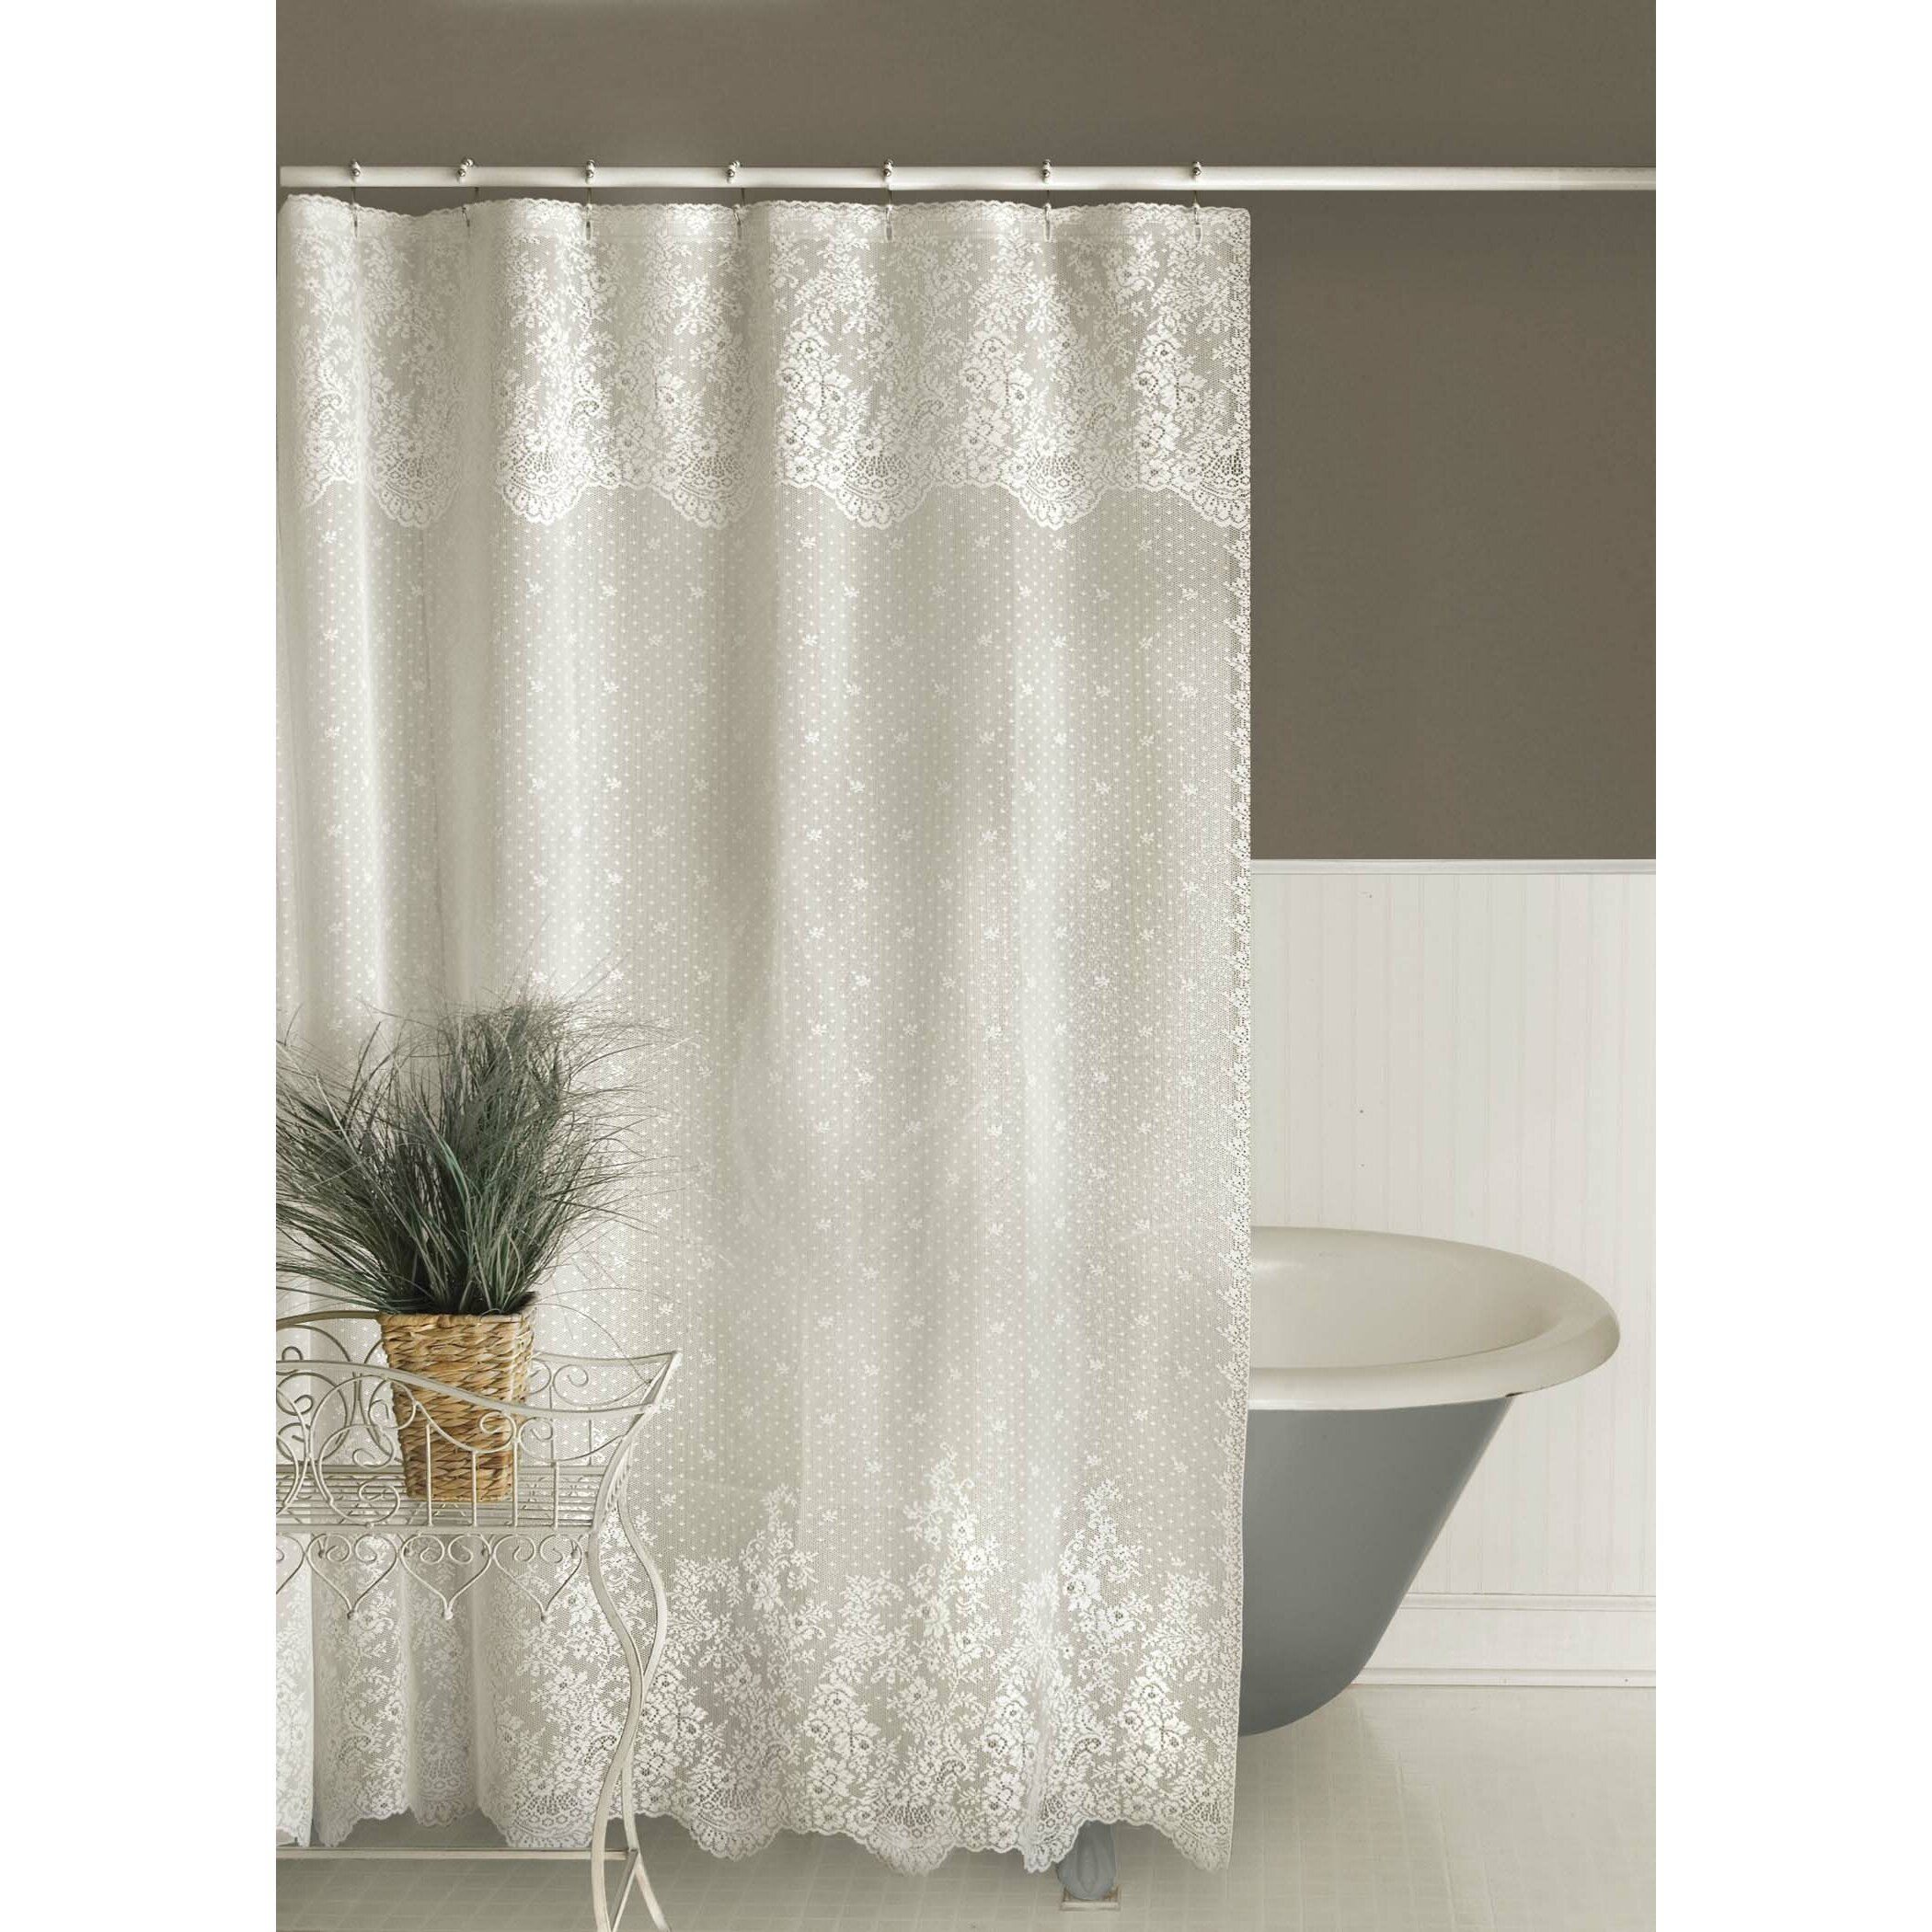 Wayfair Home Decor Curtains Best Home Design And